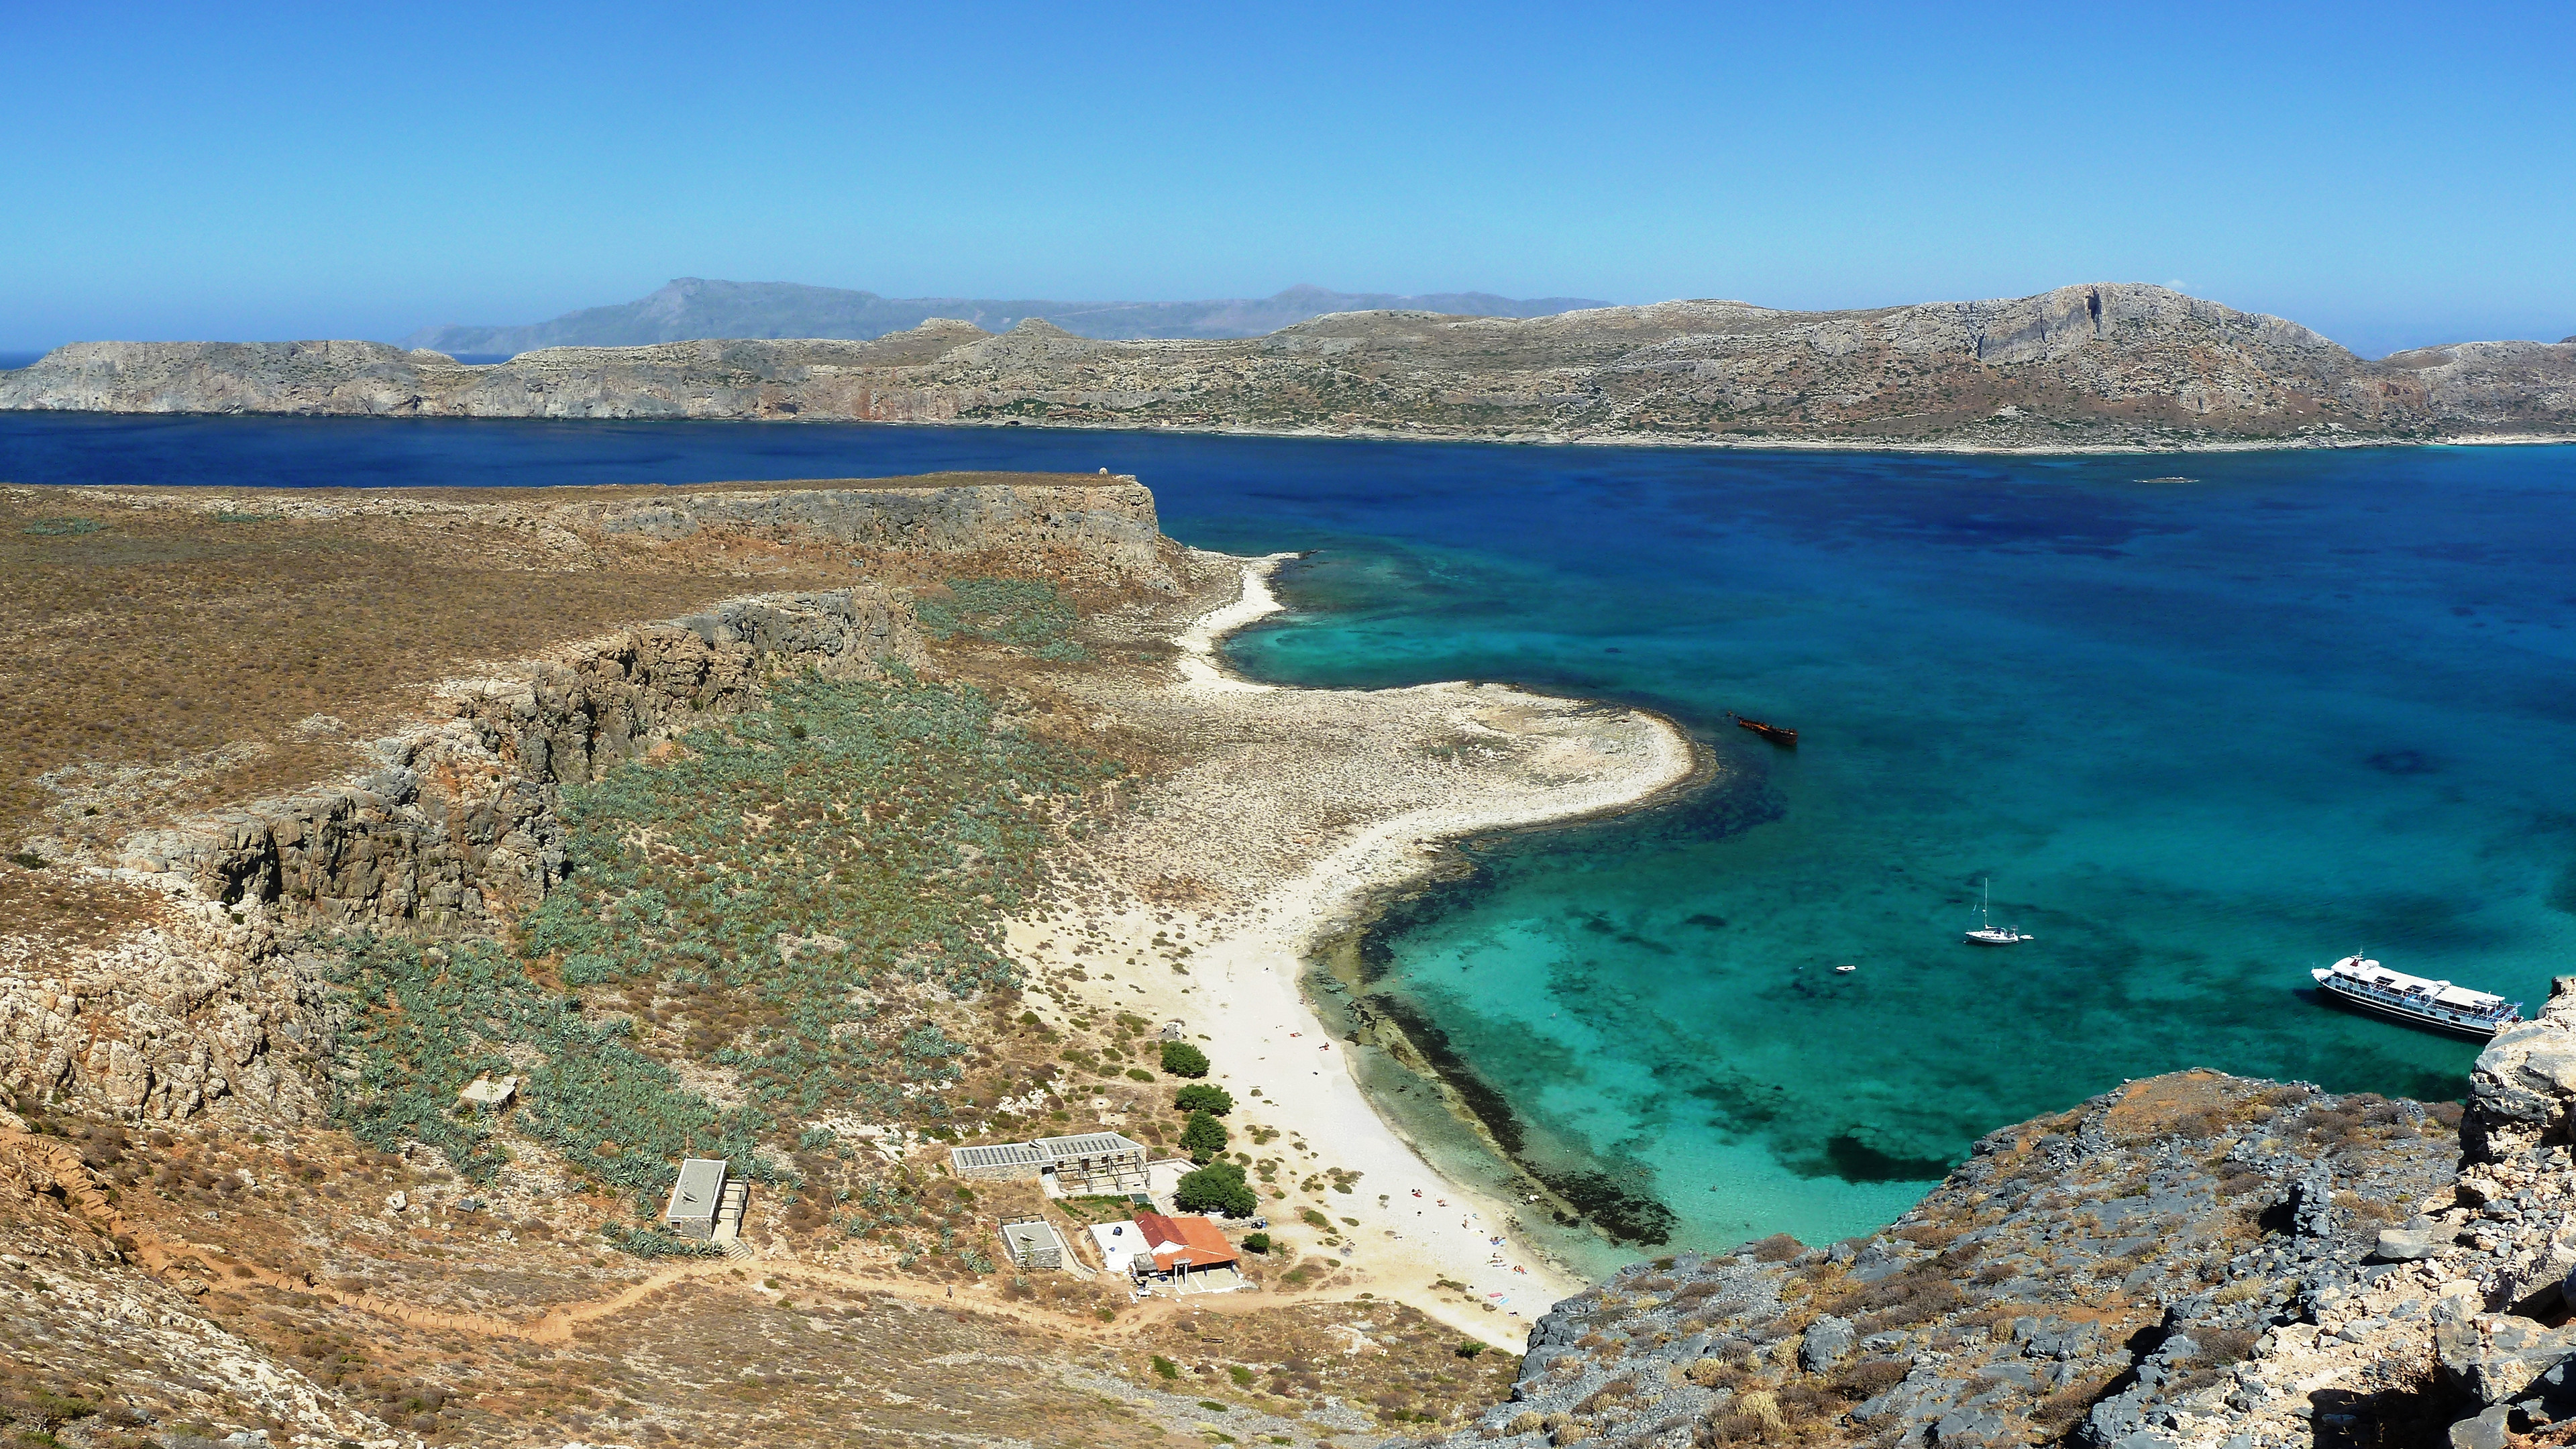 залив греция море бесплатно